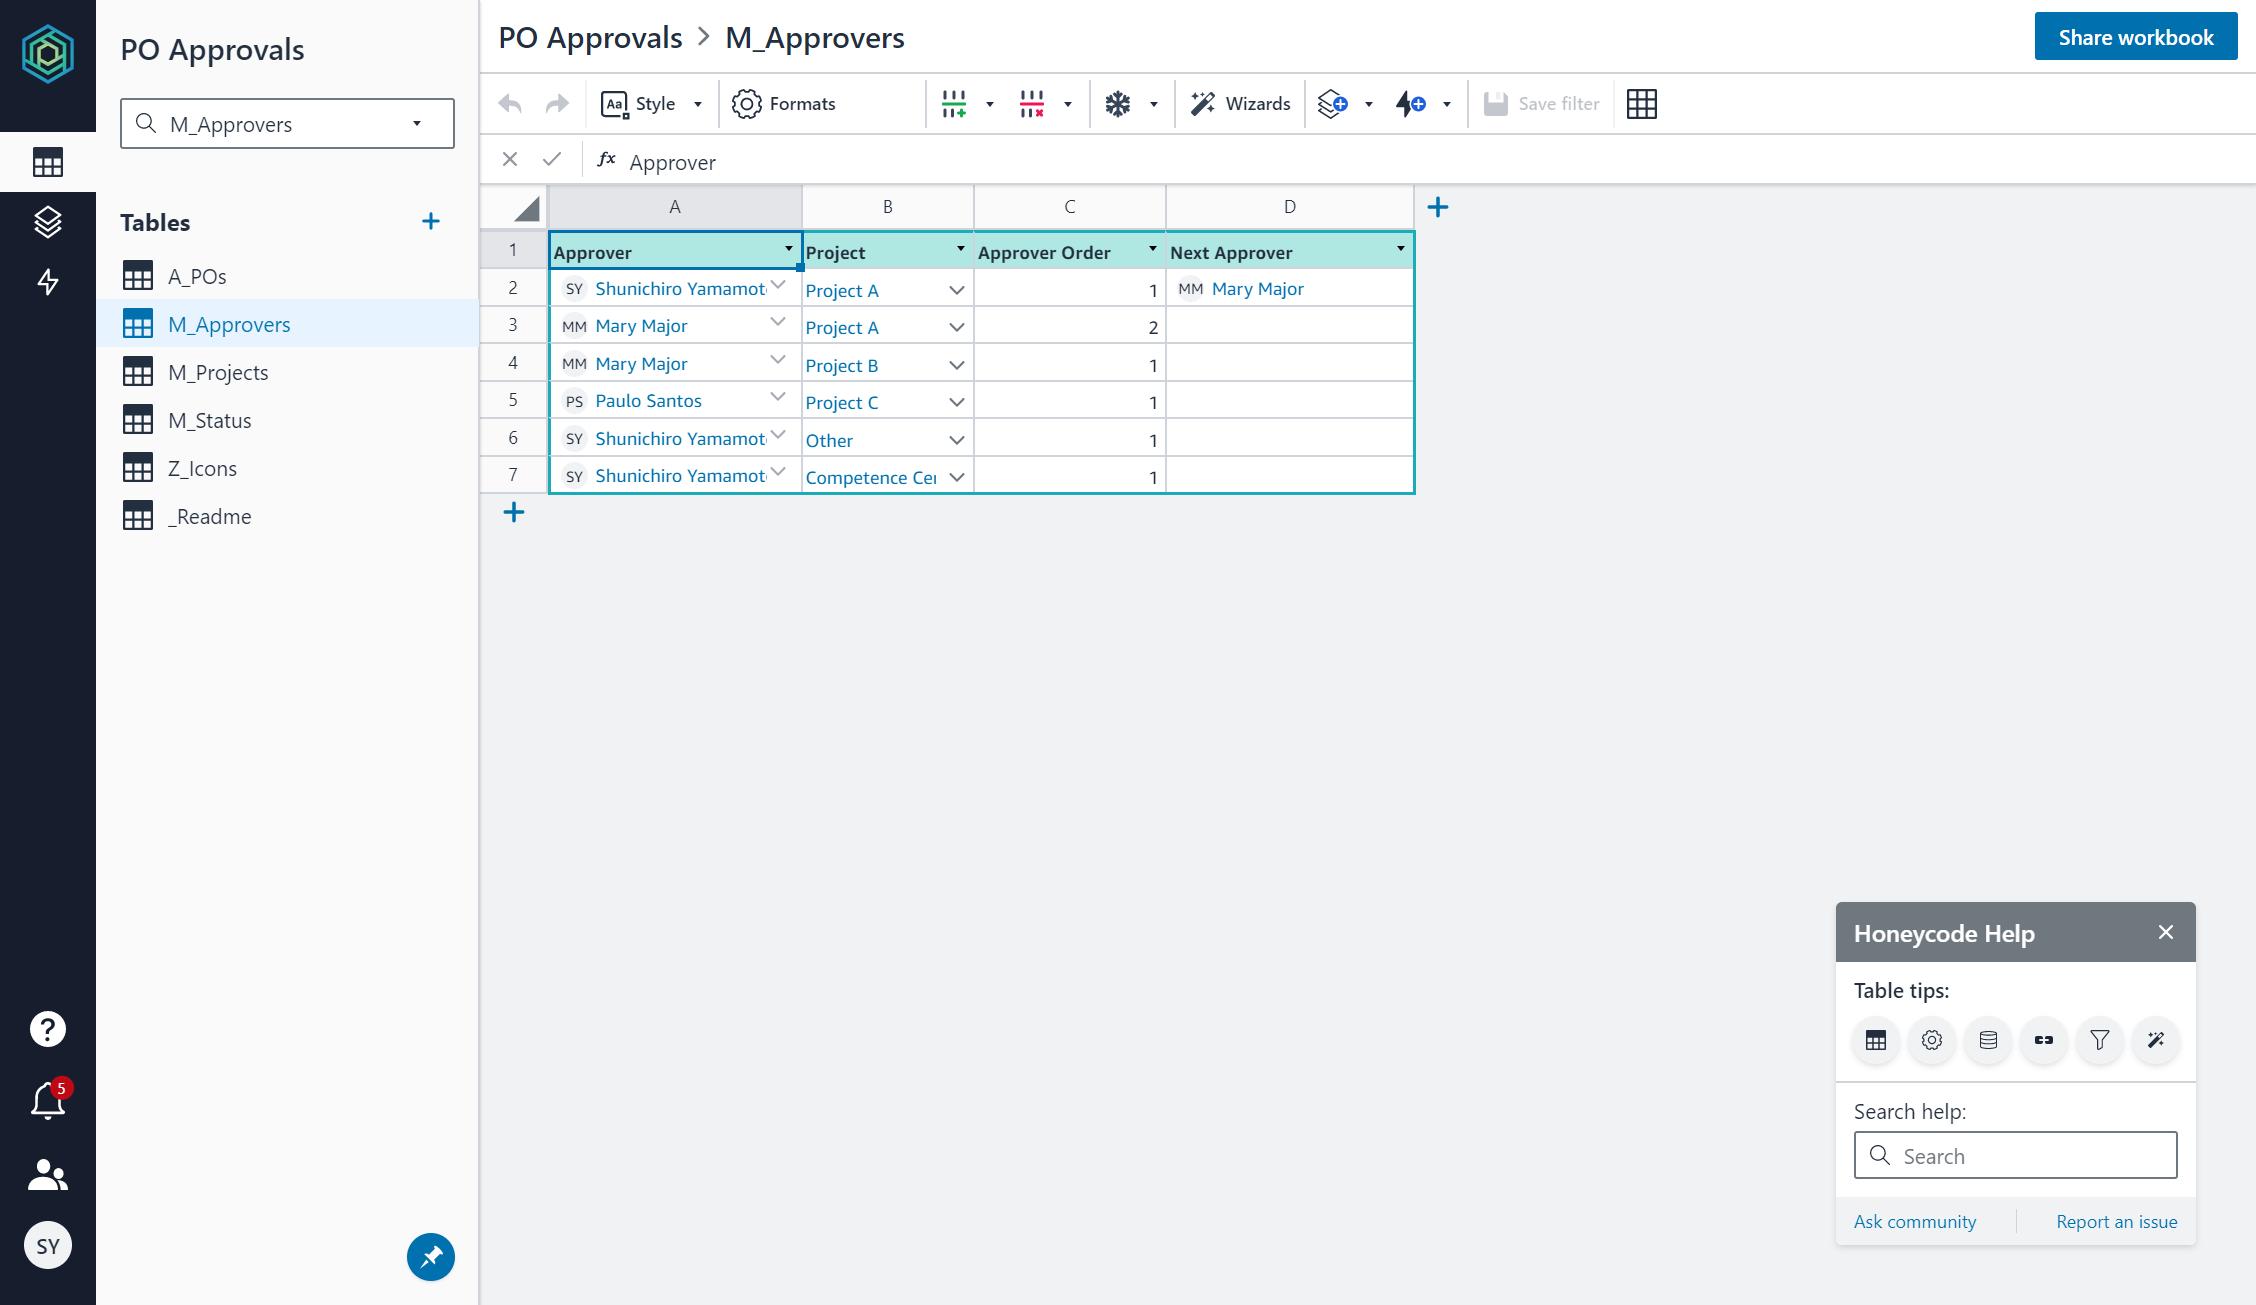 screenshot-builder.honeycode.aws-2020.06.28-18_42_20.png